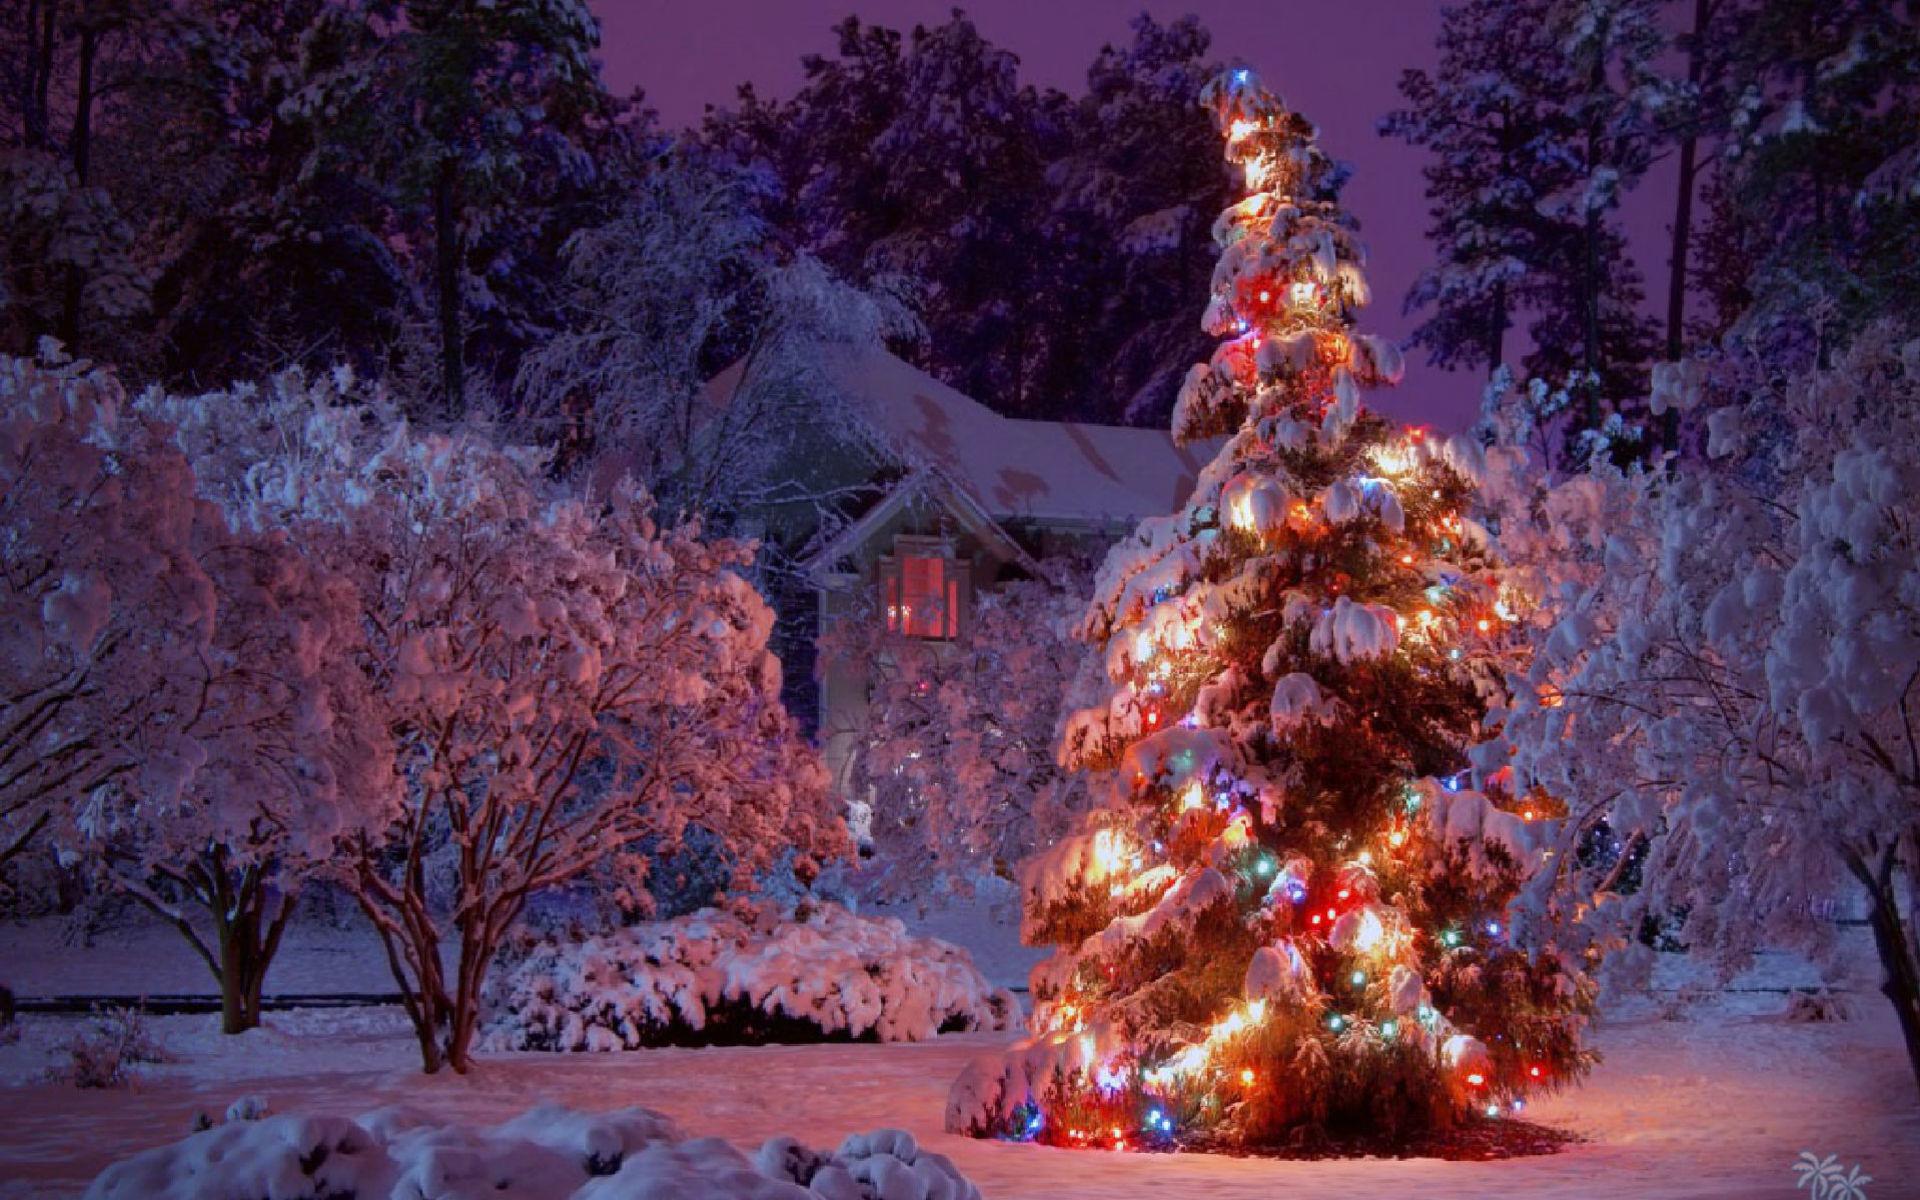 Christmas winter scenes wallpaper - Christmas village wallpaper widescreen ...